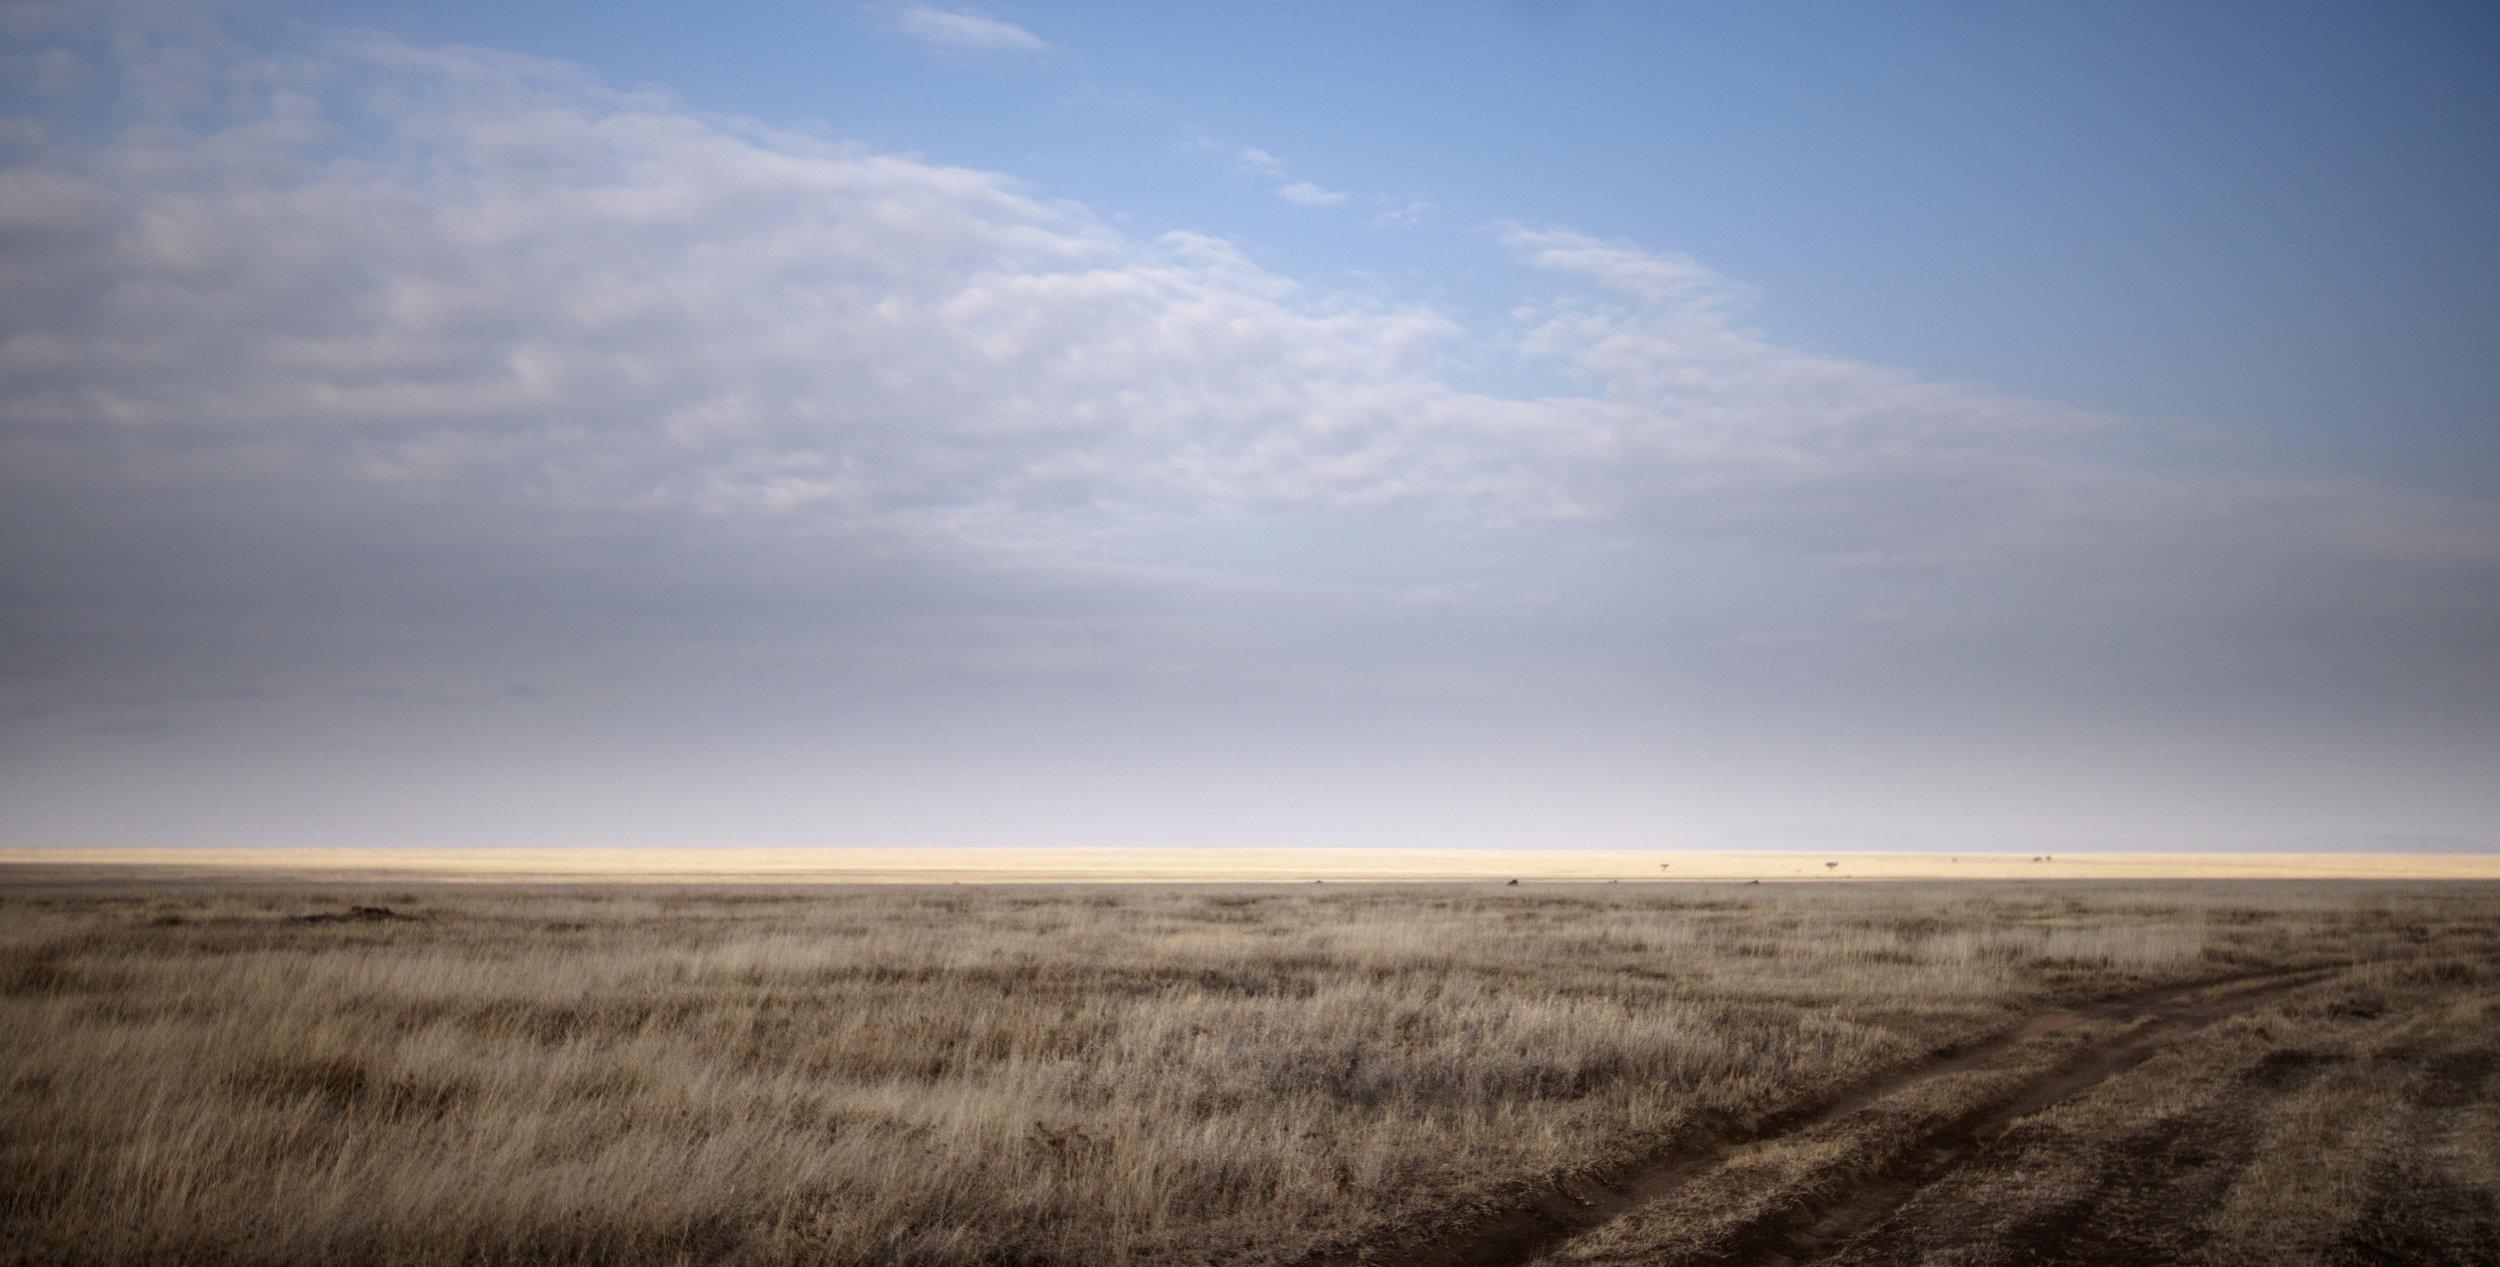 Serengeti-Scenery-Eric-Frank-MR.jpg